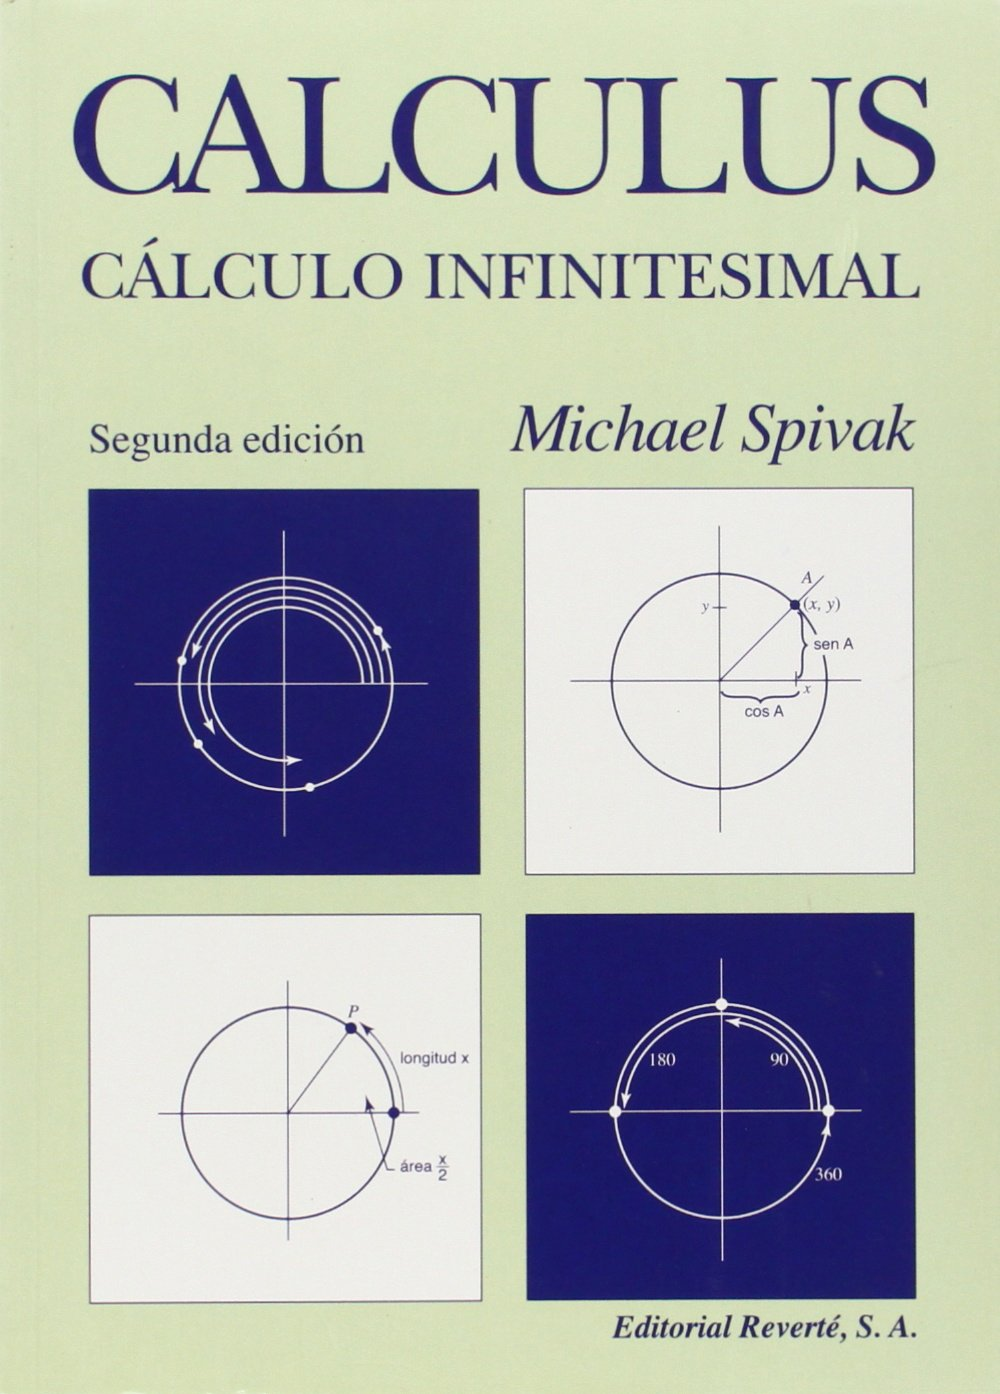 calculo infinitesimal michael spivak